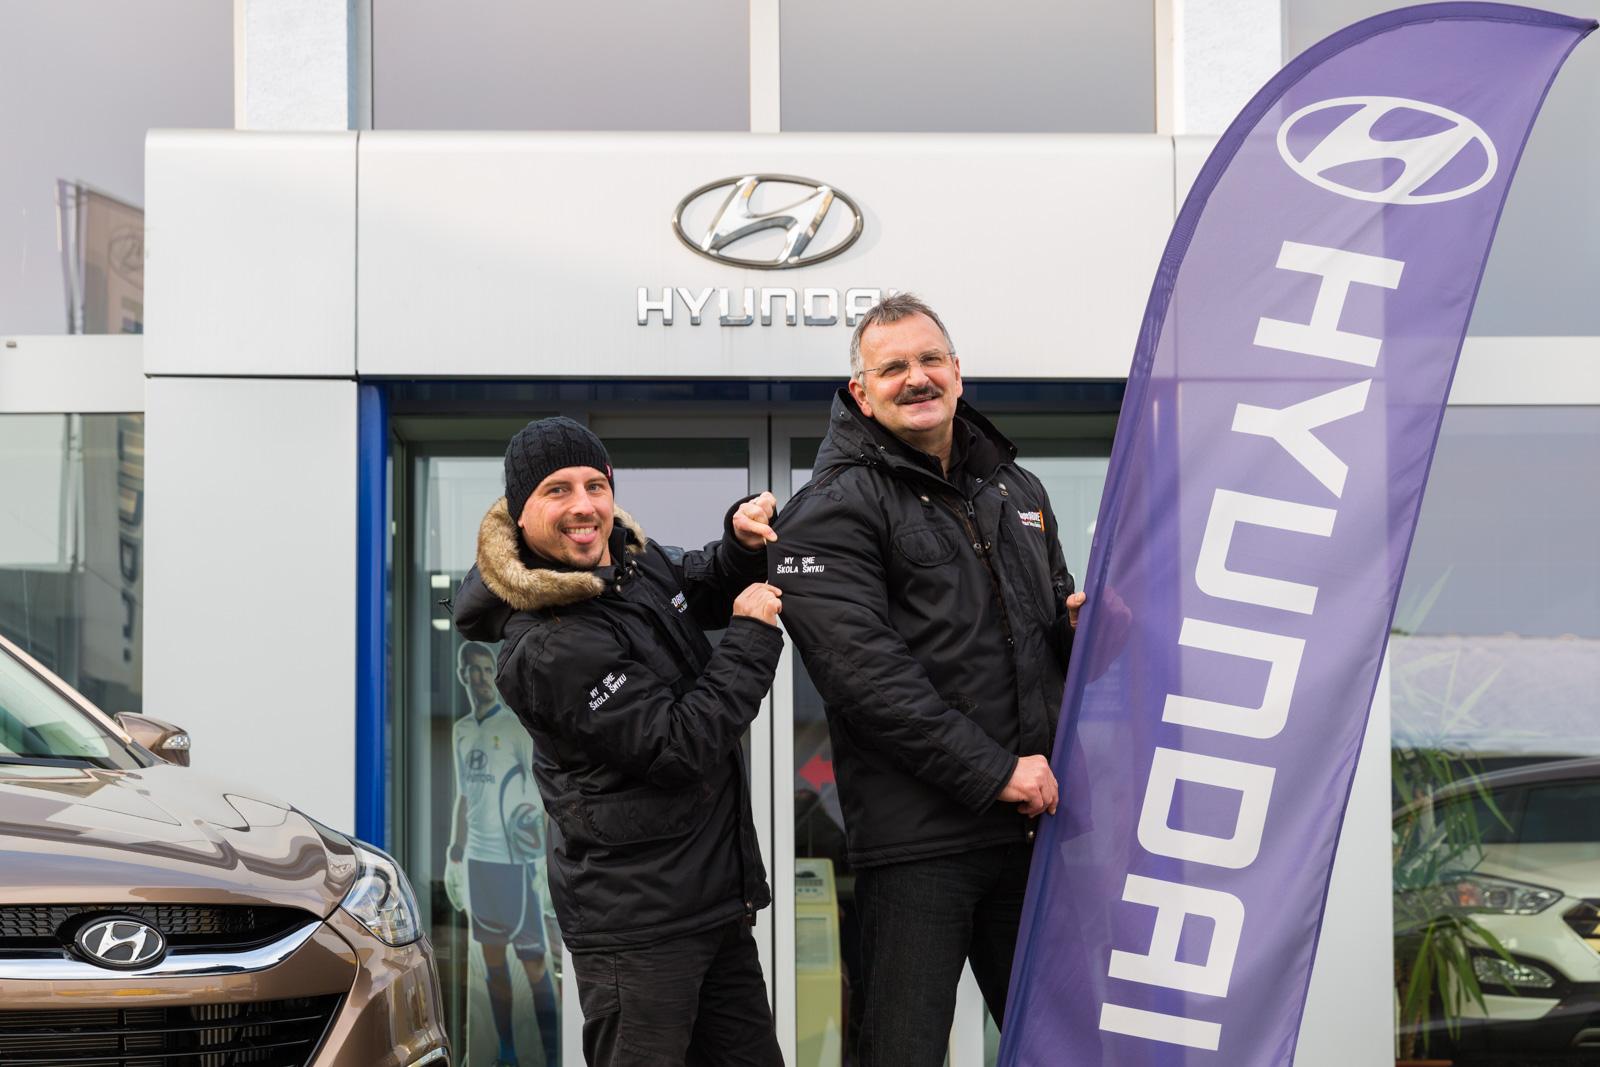 SuperDRIVE partnerstvo Hyundai